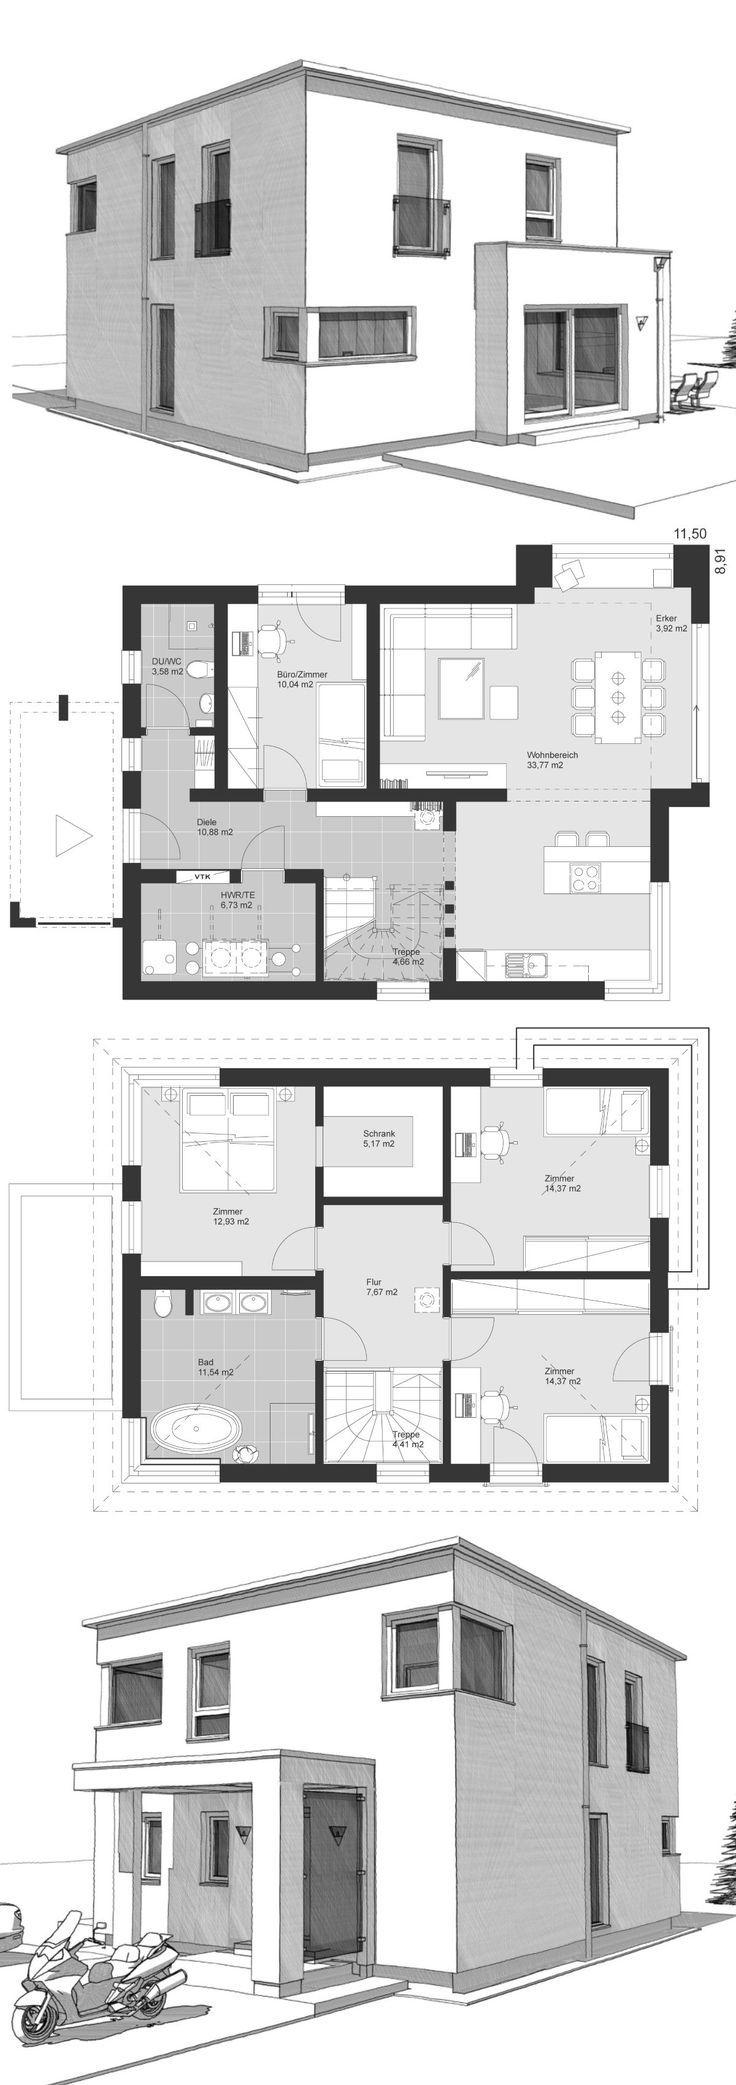 ELK Haus 140 im modernen Alpenstil ELK Fertighaus